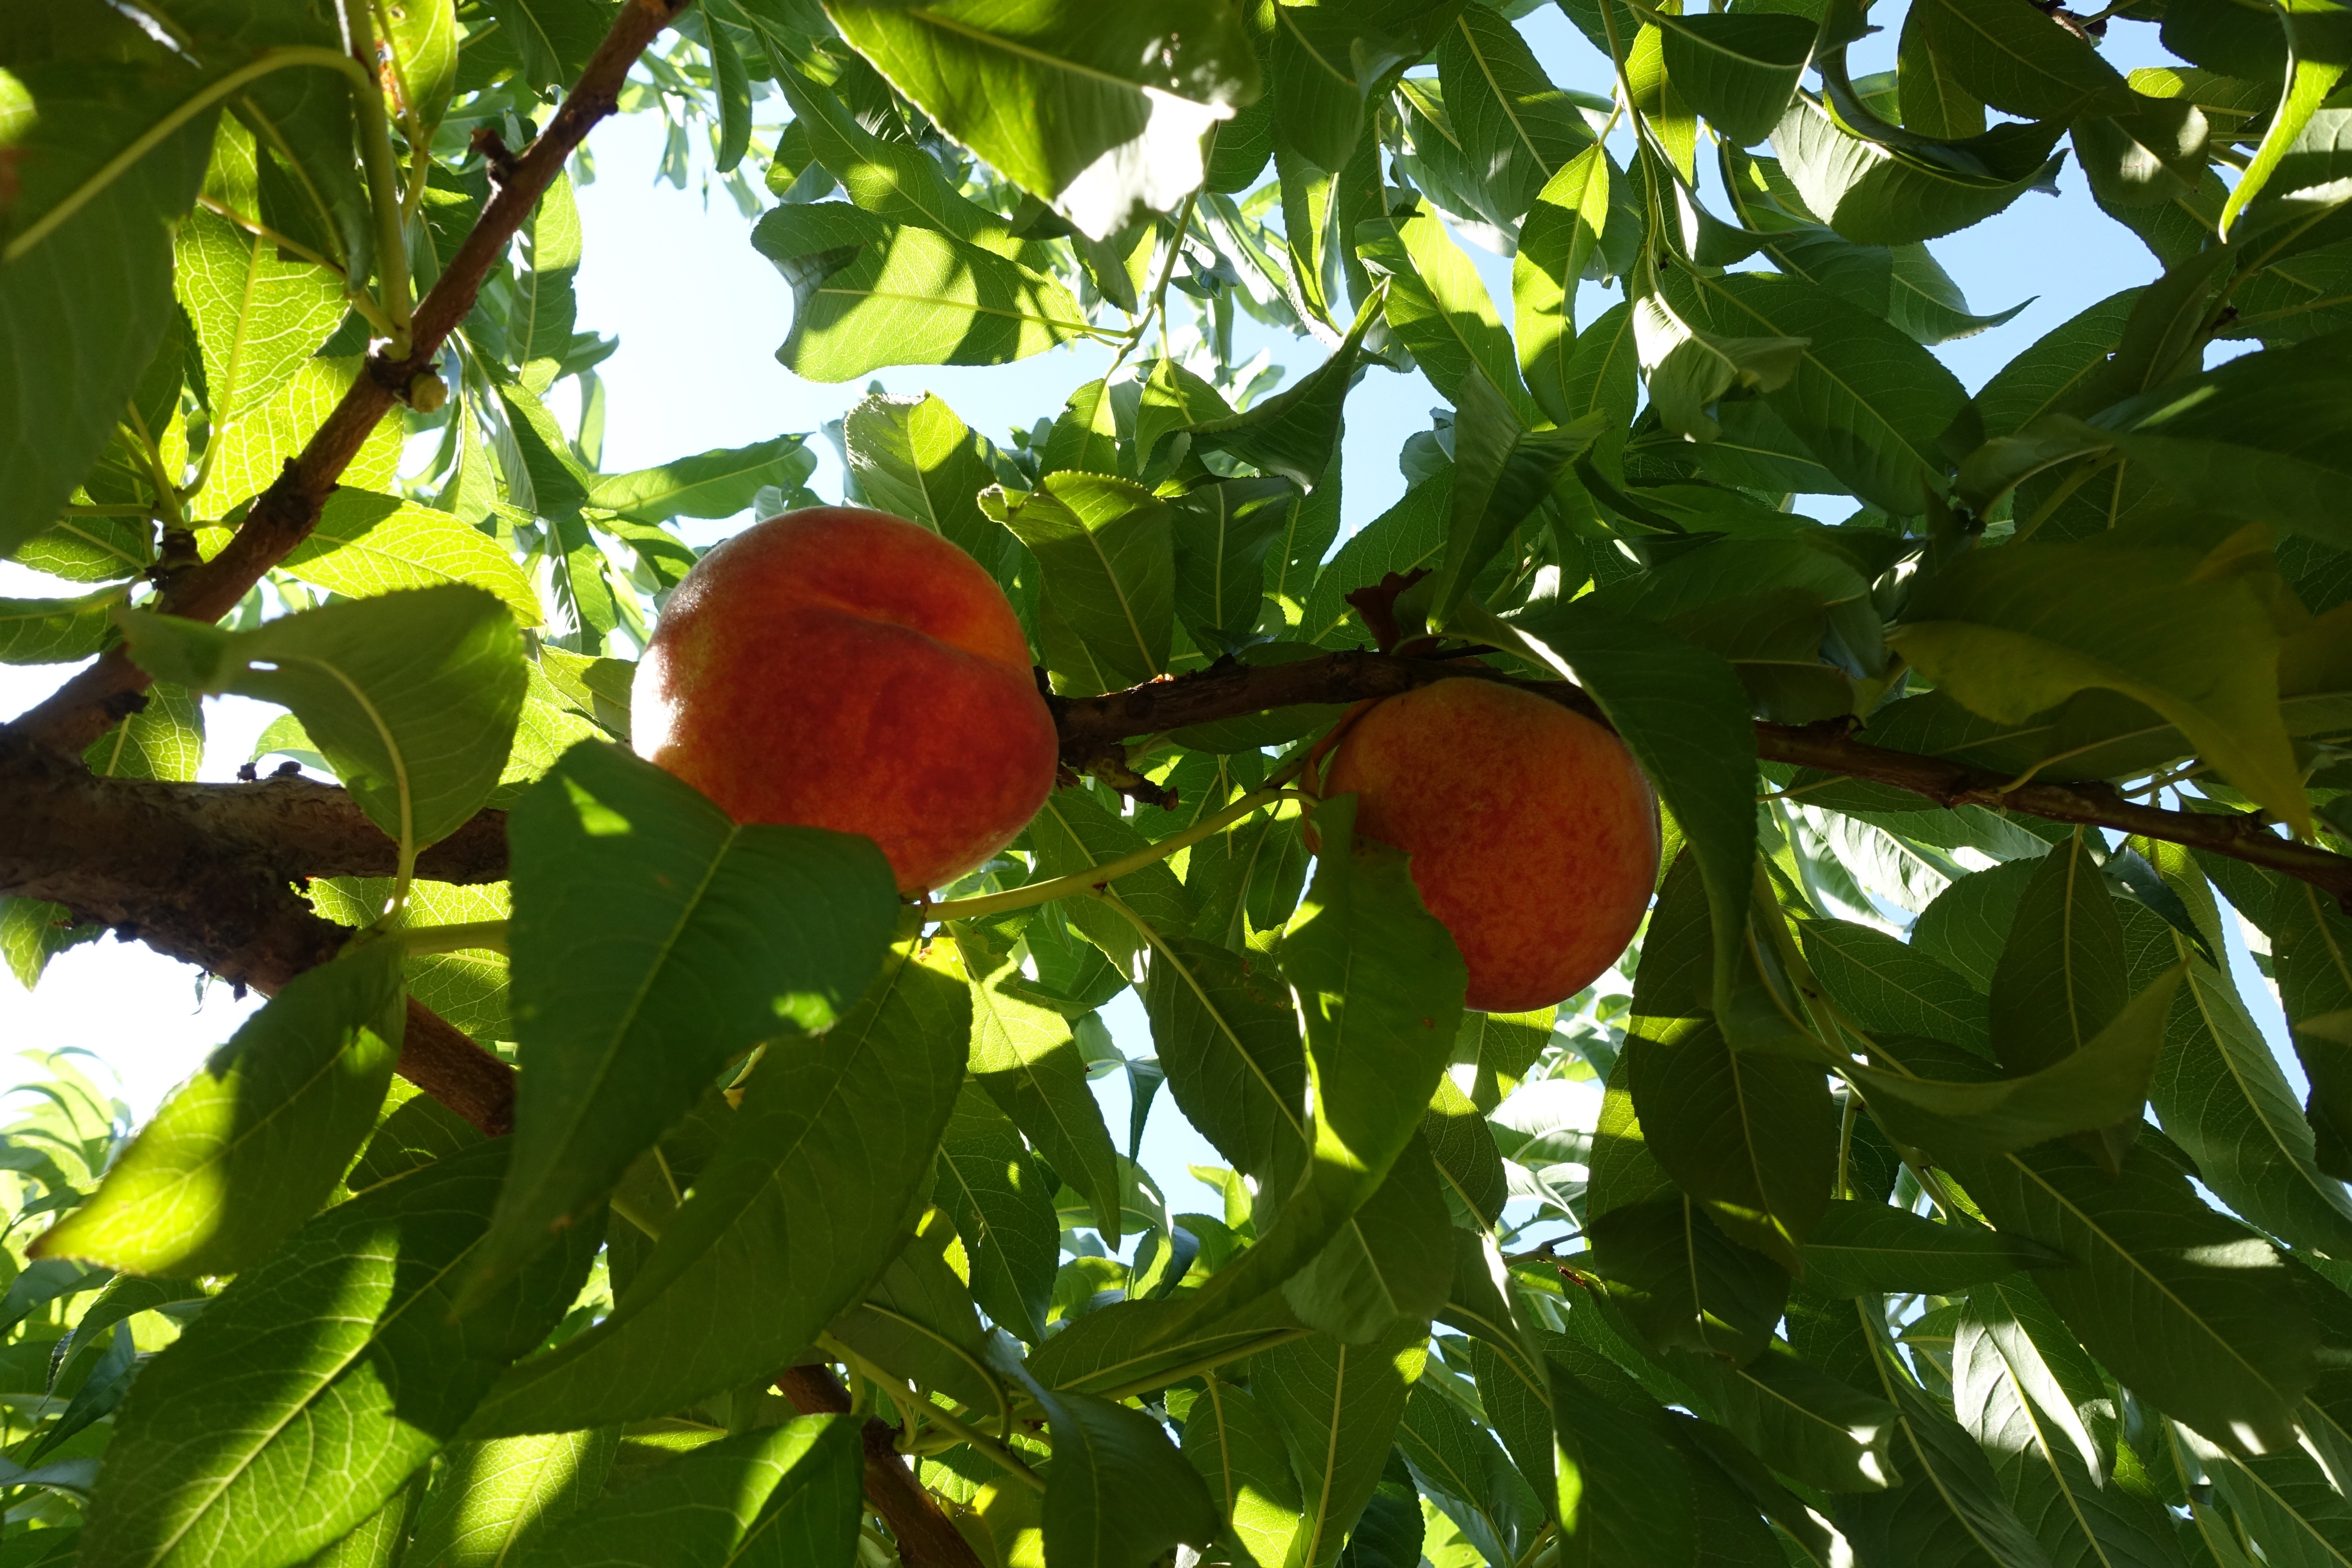 Peaches in sunshine